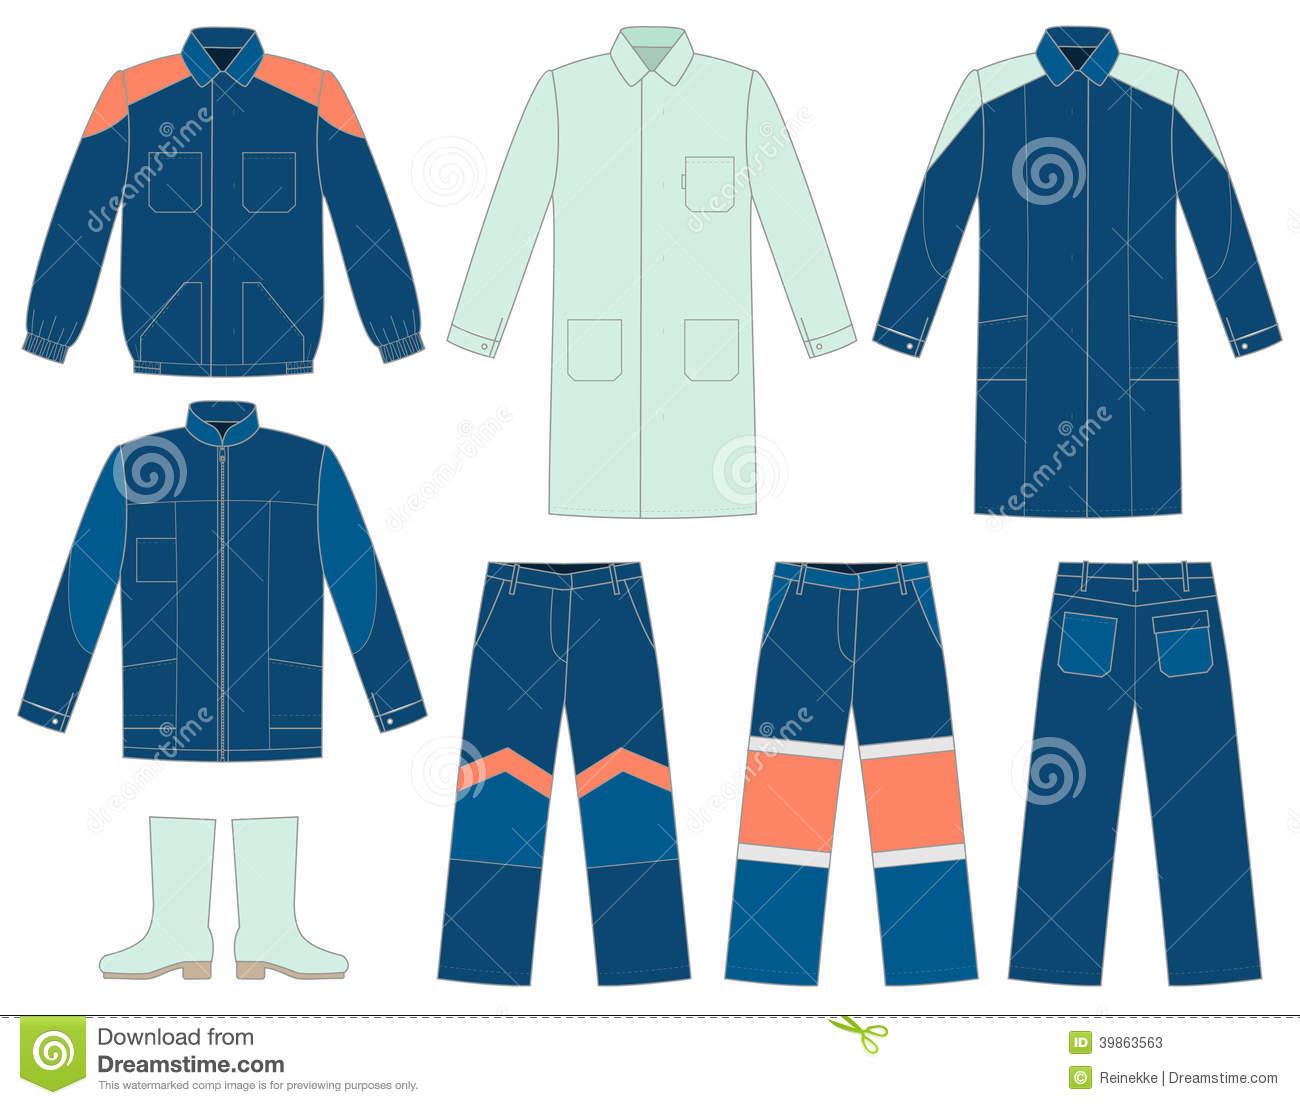 Work uniform clipart.